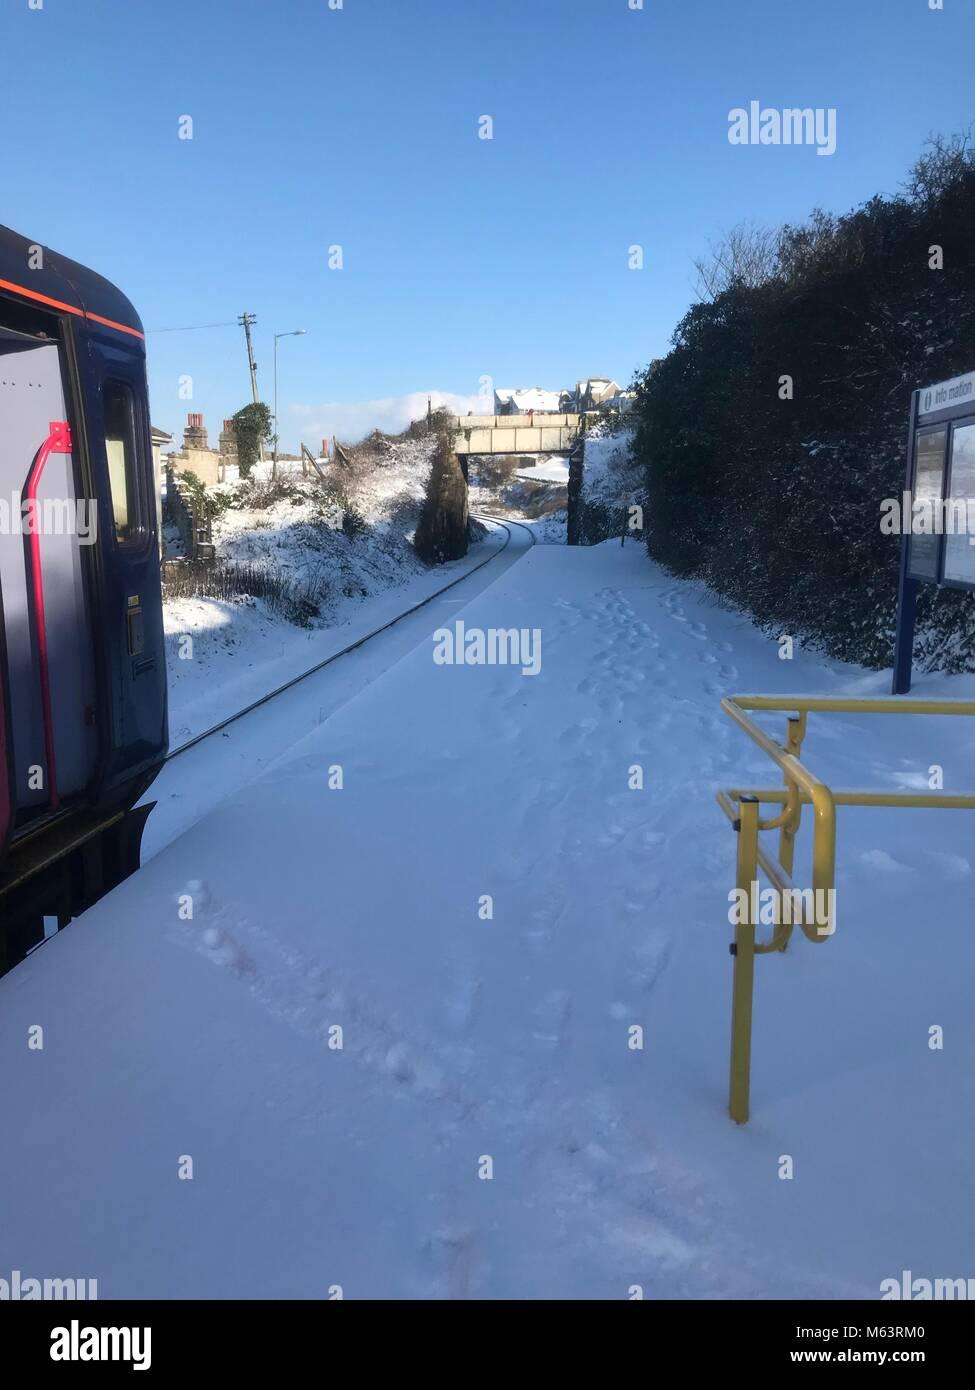 Cornwall, UK. 28th February, 2018. Snow storm hits Carbis Bay, Cornwall. Credit: Kara Bell/Alamy Live News - Stock Image